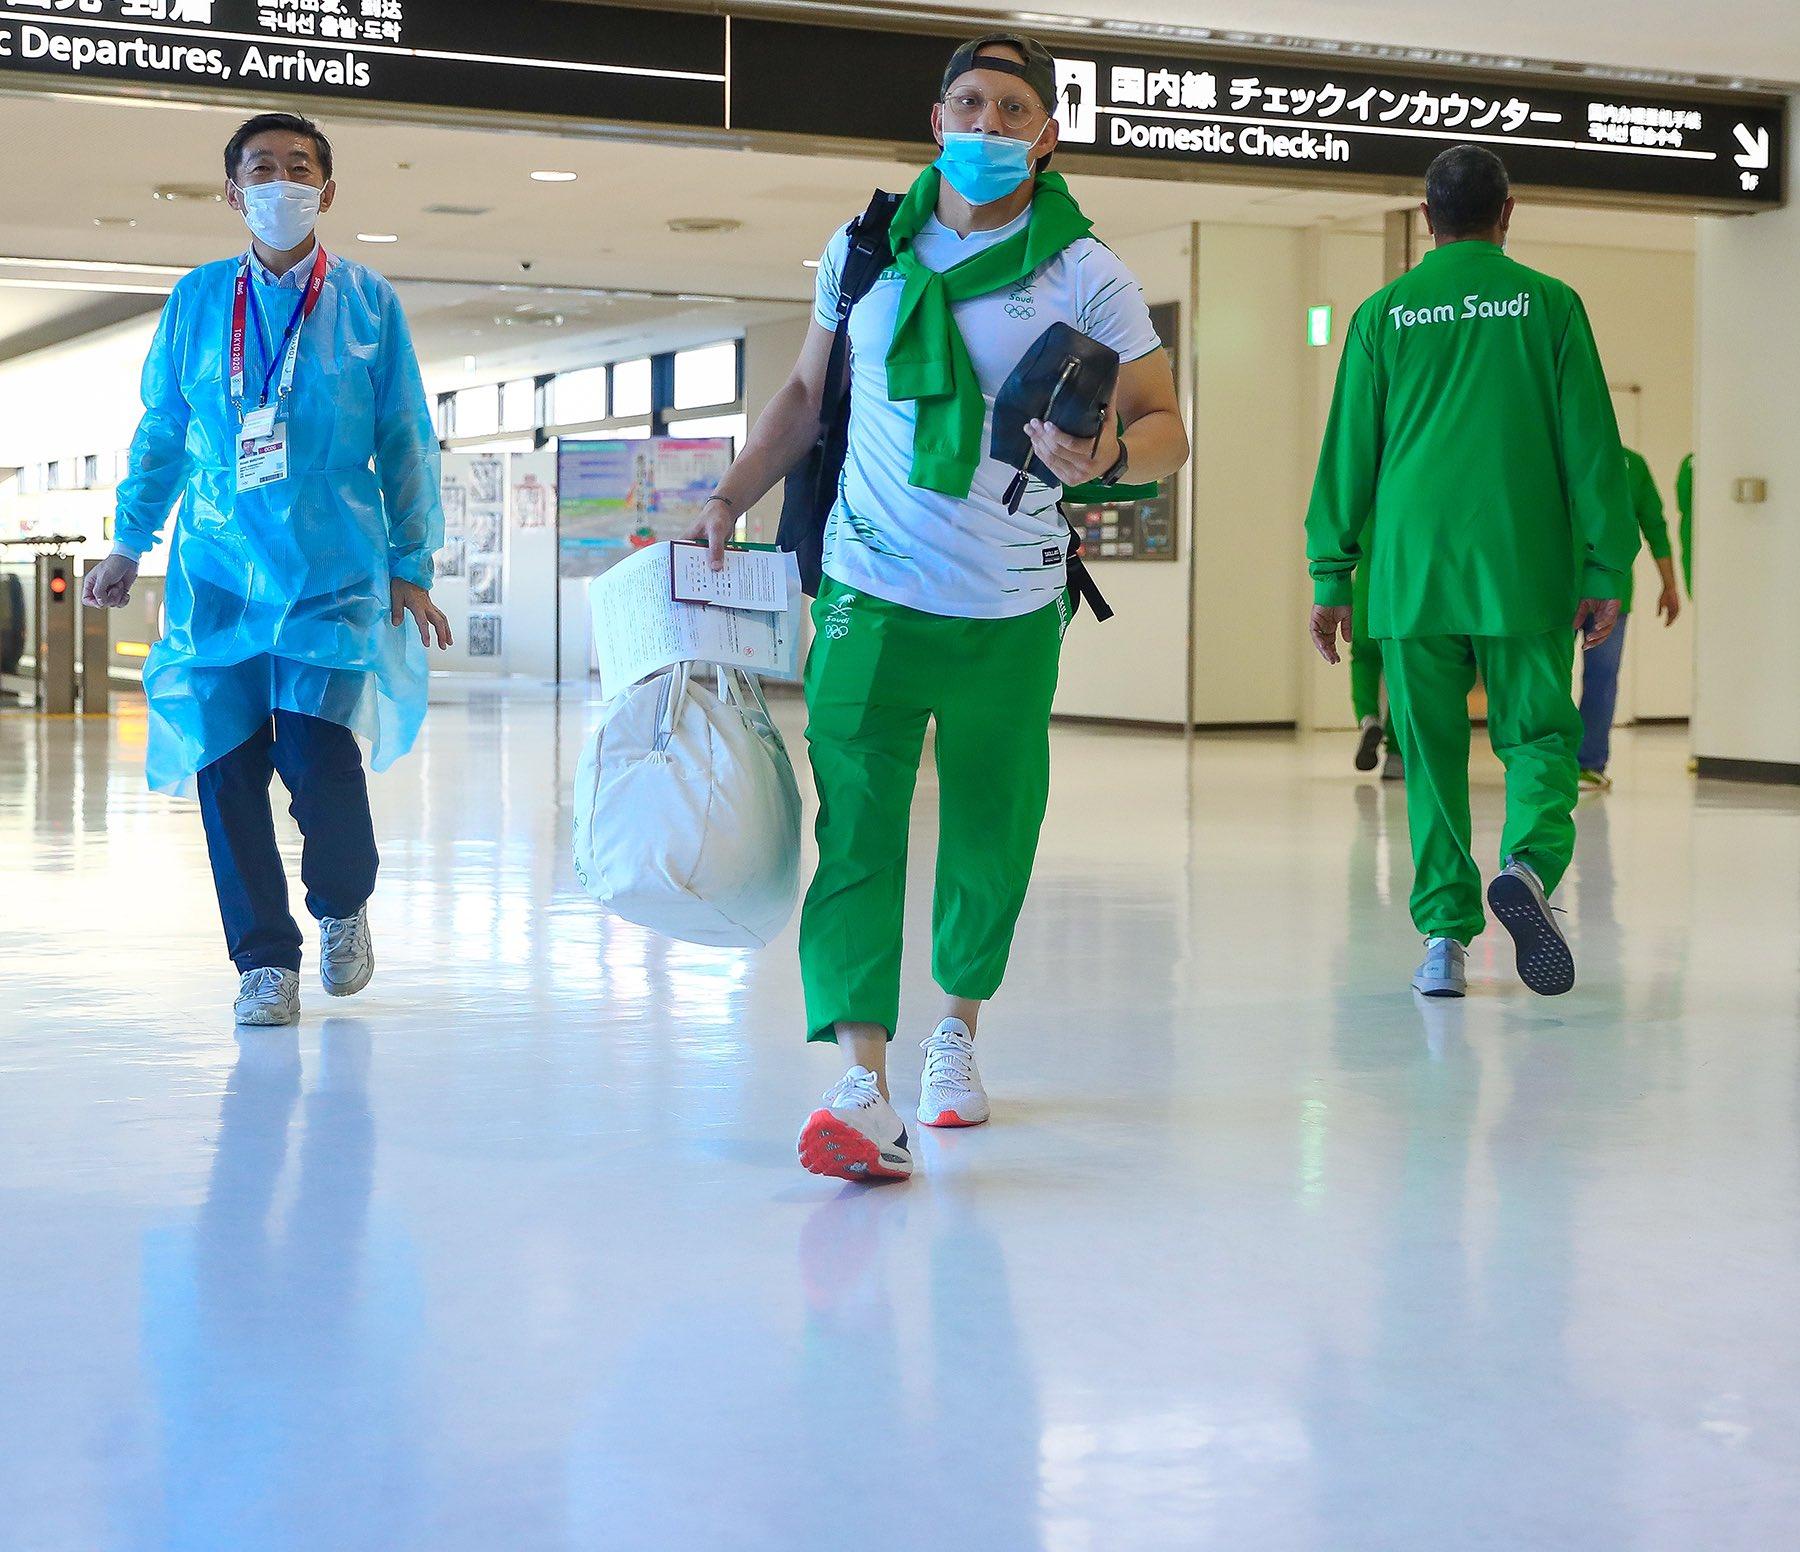 Saudi weightlifters Siraj Al-Saleem and Mahmoud Al-Humayd arrive in Tokyo for the Olympic games. (Twitter/@saudiolympic)